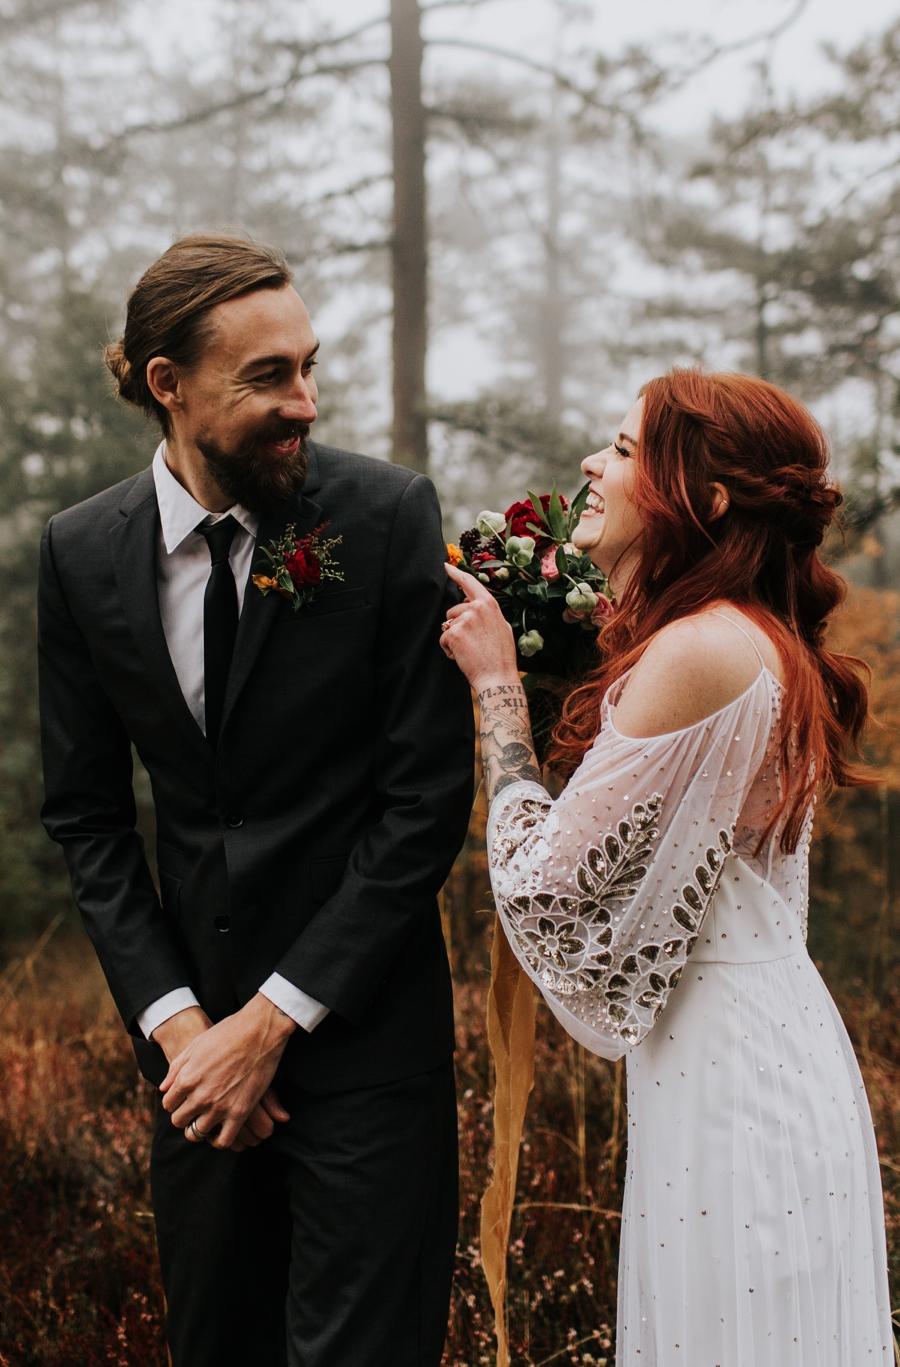 Herfstbruiloft bruidspaar